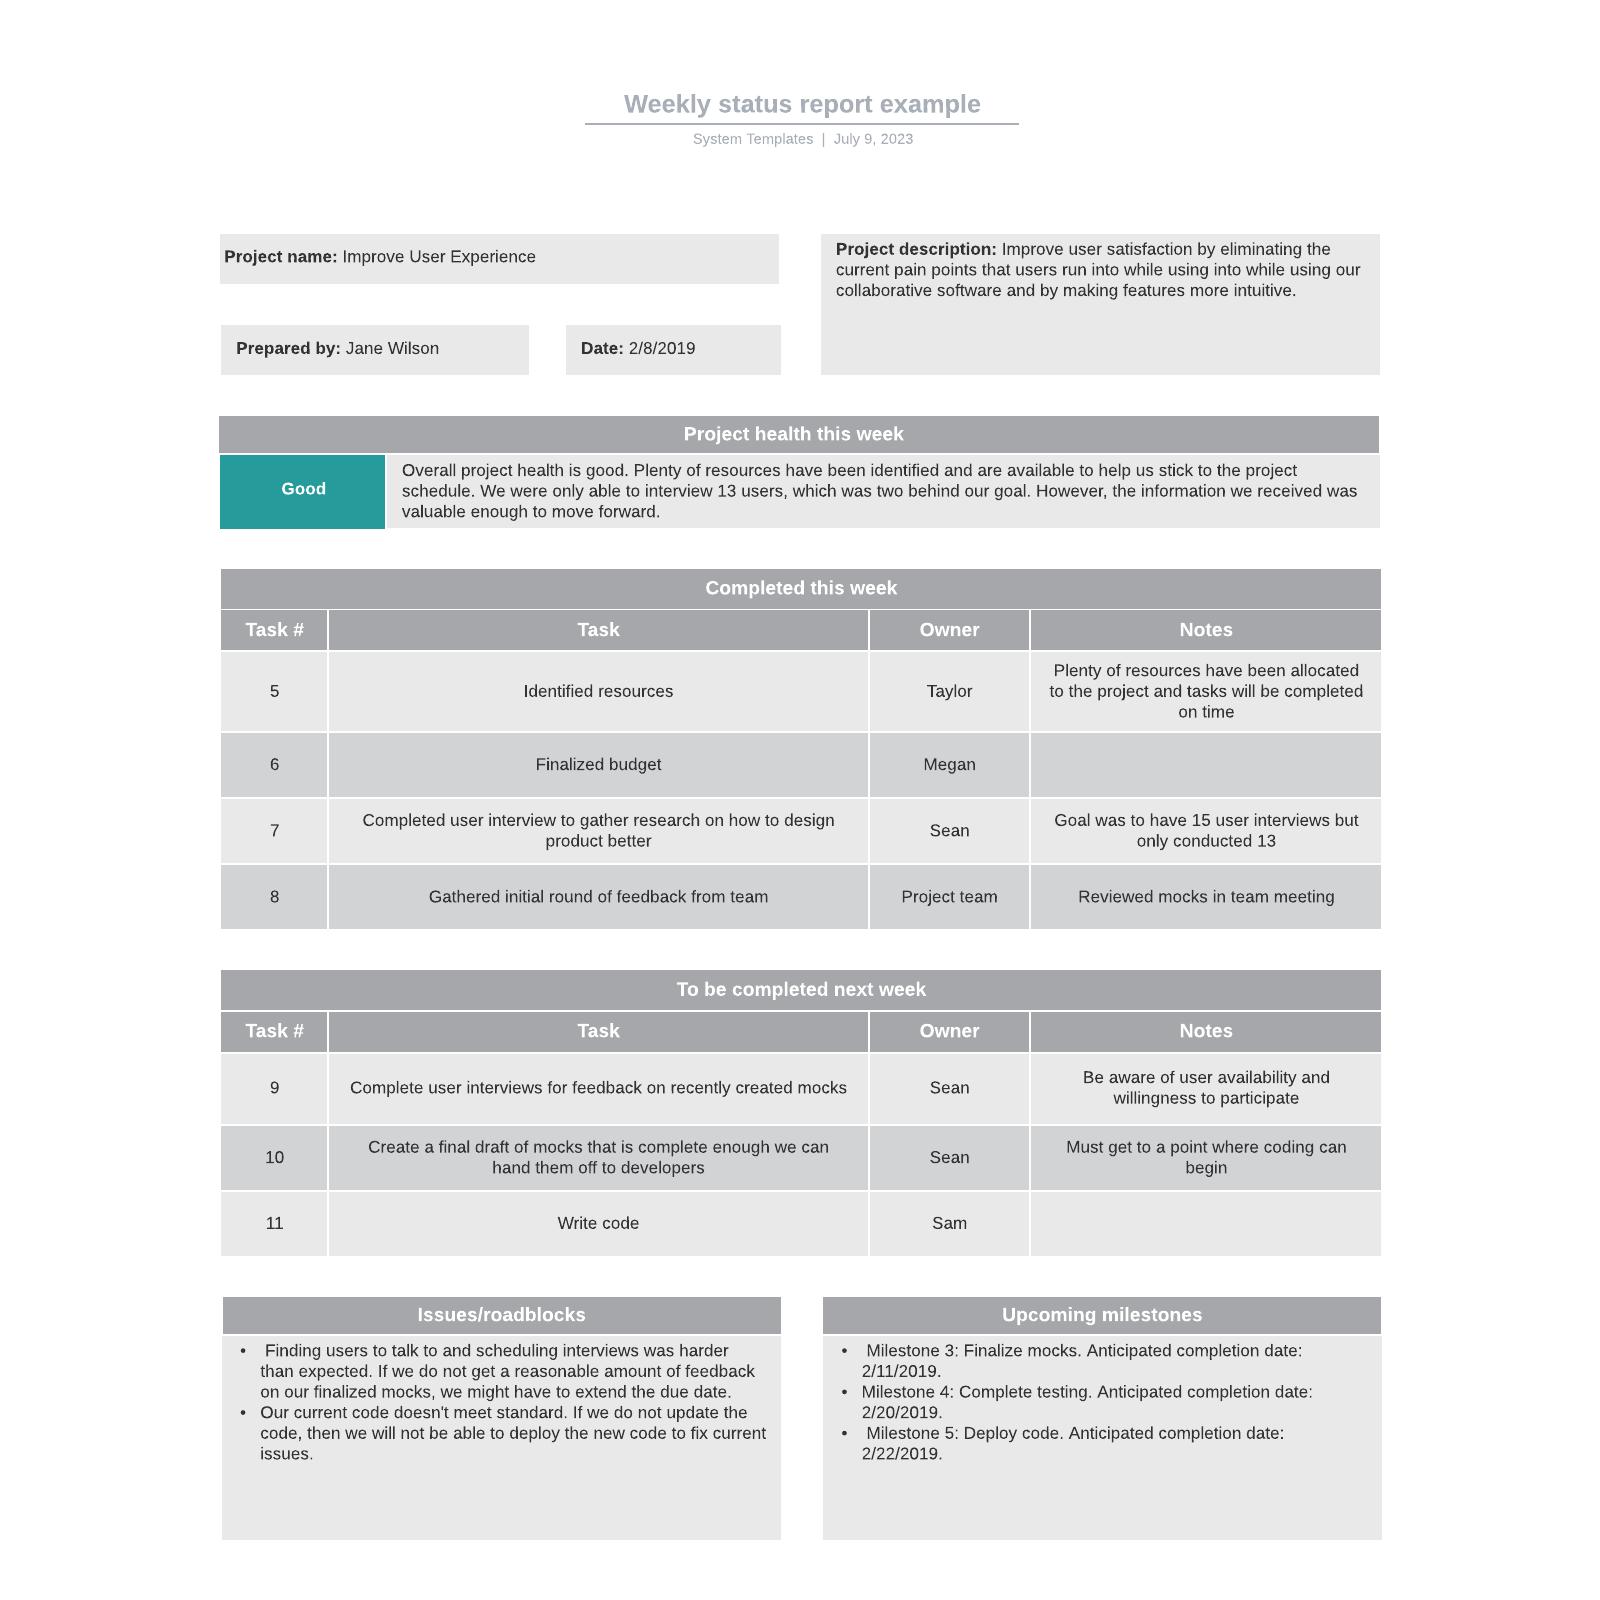 Weekly status report example